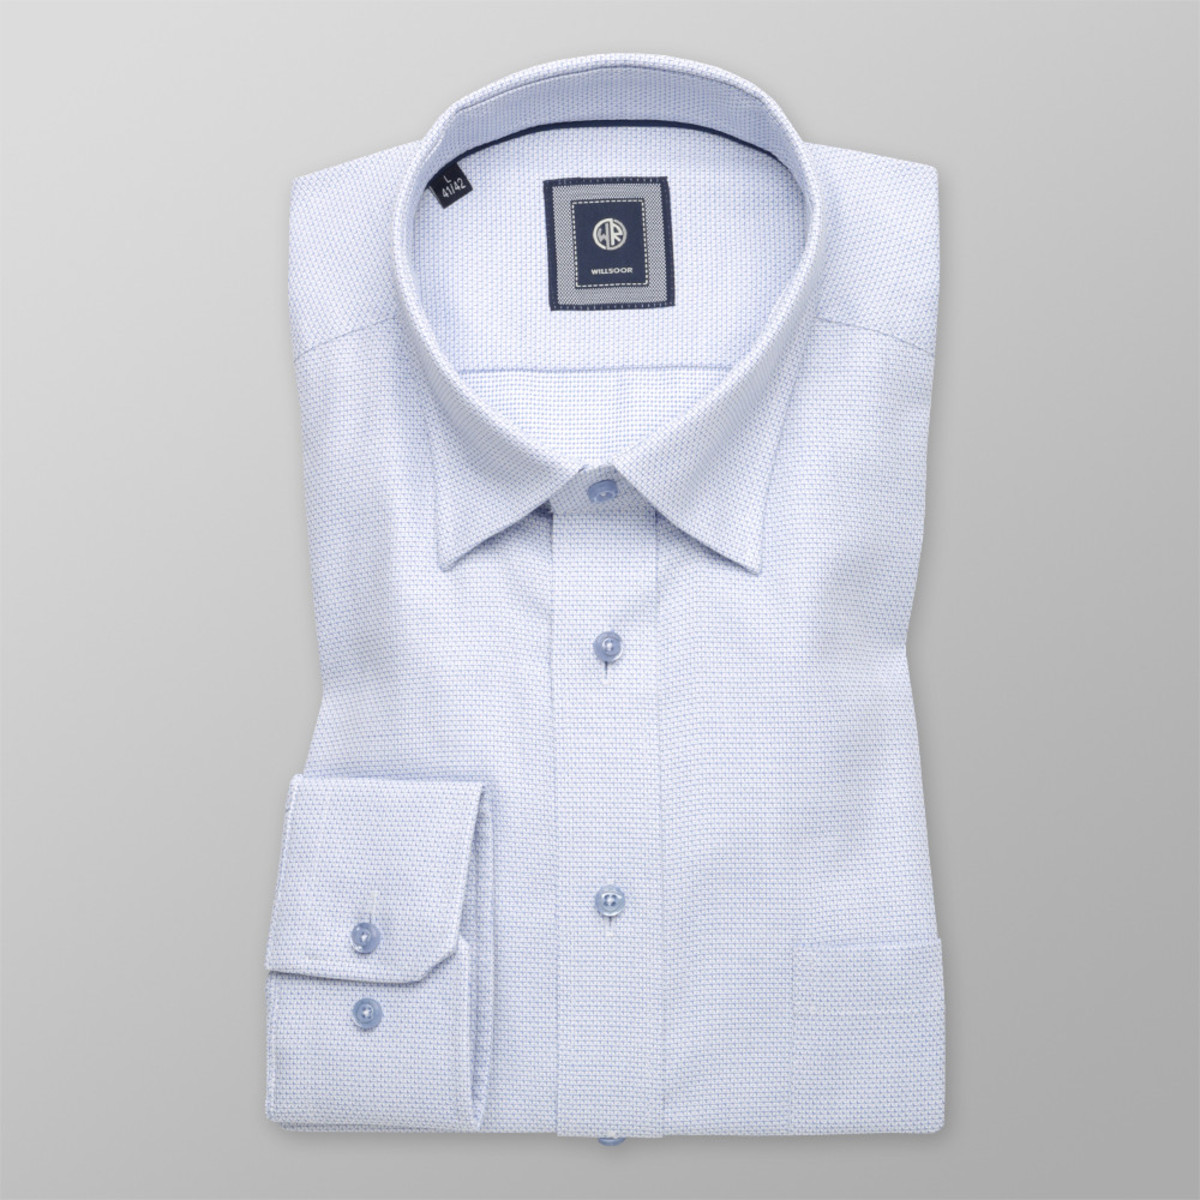 Košile London jemný modrý vzor (výška 176-182) 10232 176-182 / M (39/40)